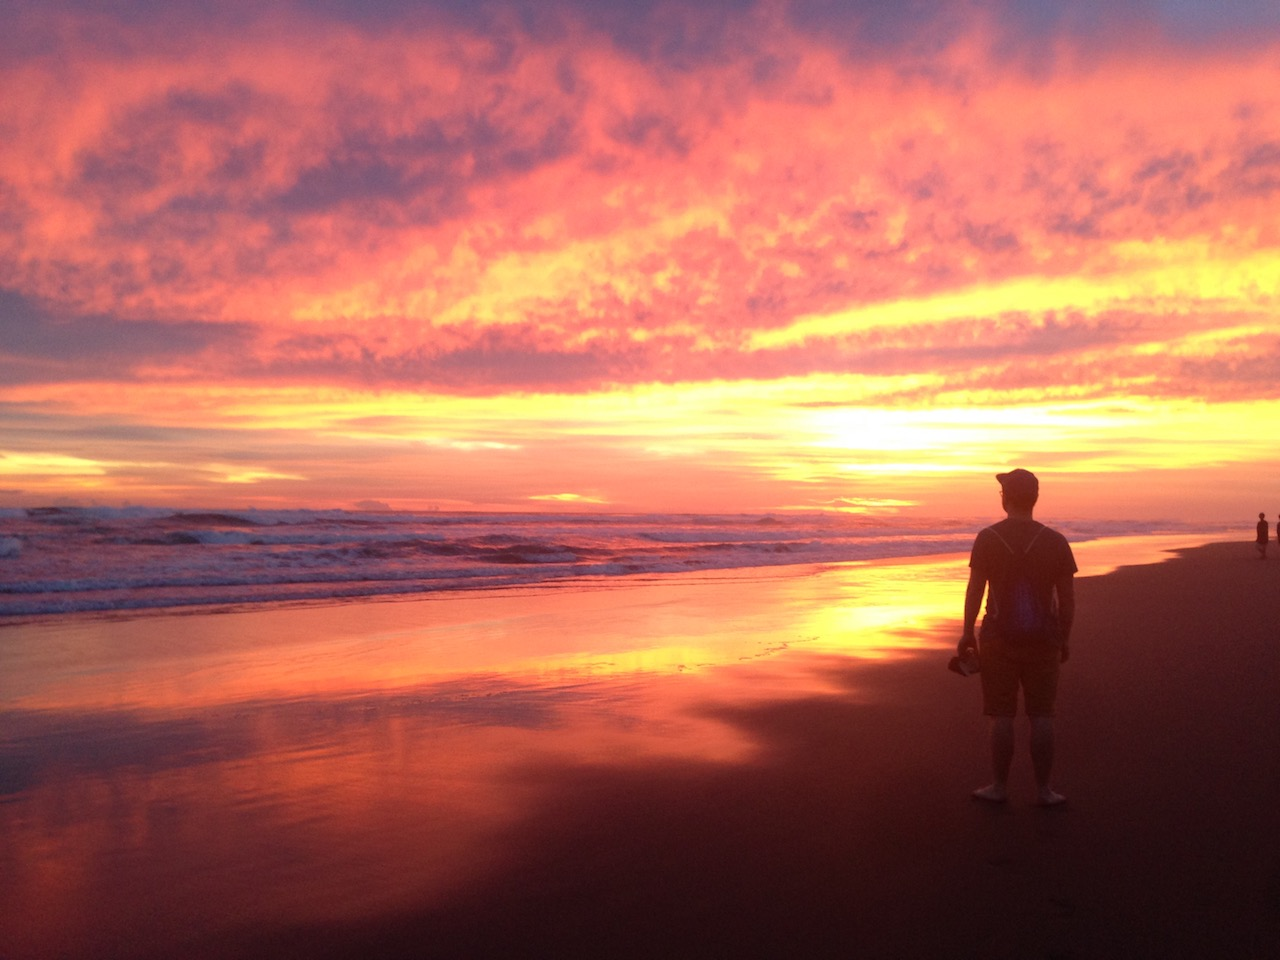 Sonnenuntergang bei Garduaction